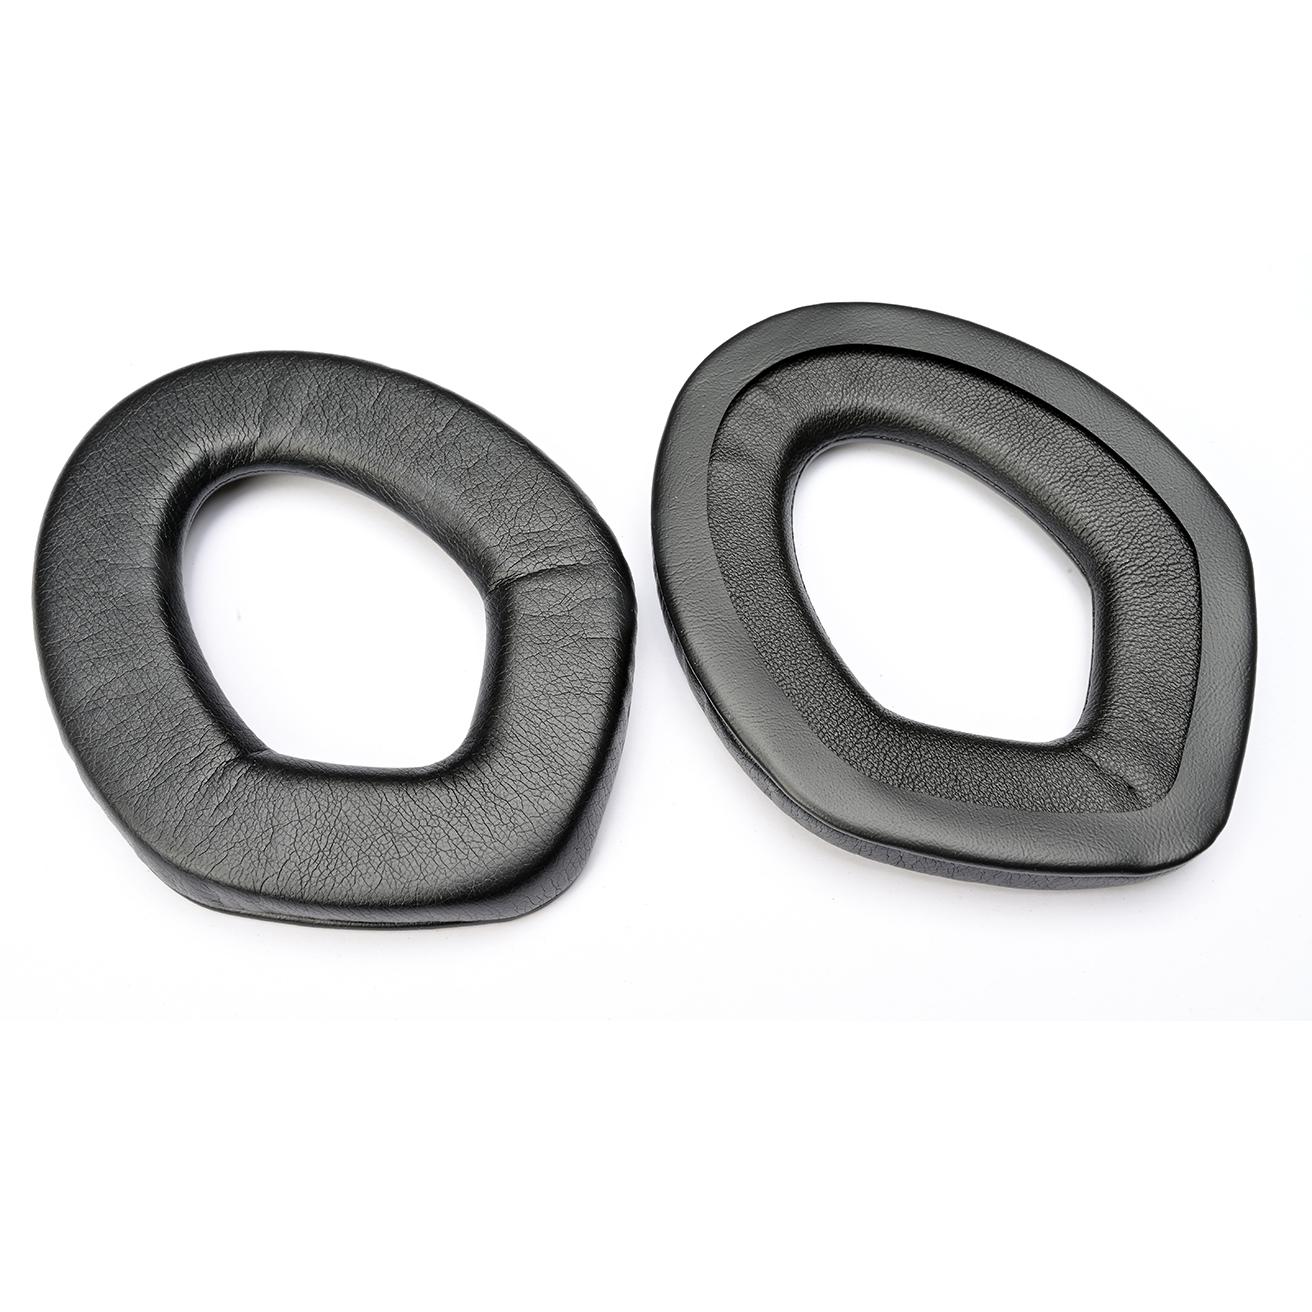 Earpads, 1 pair